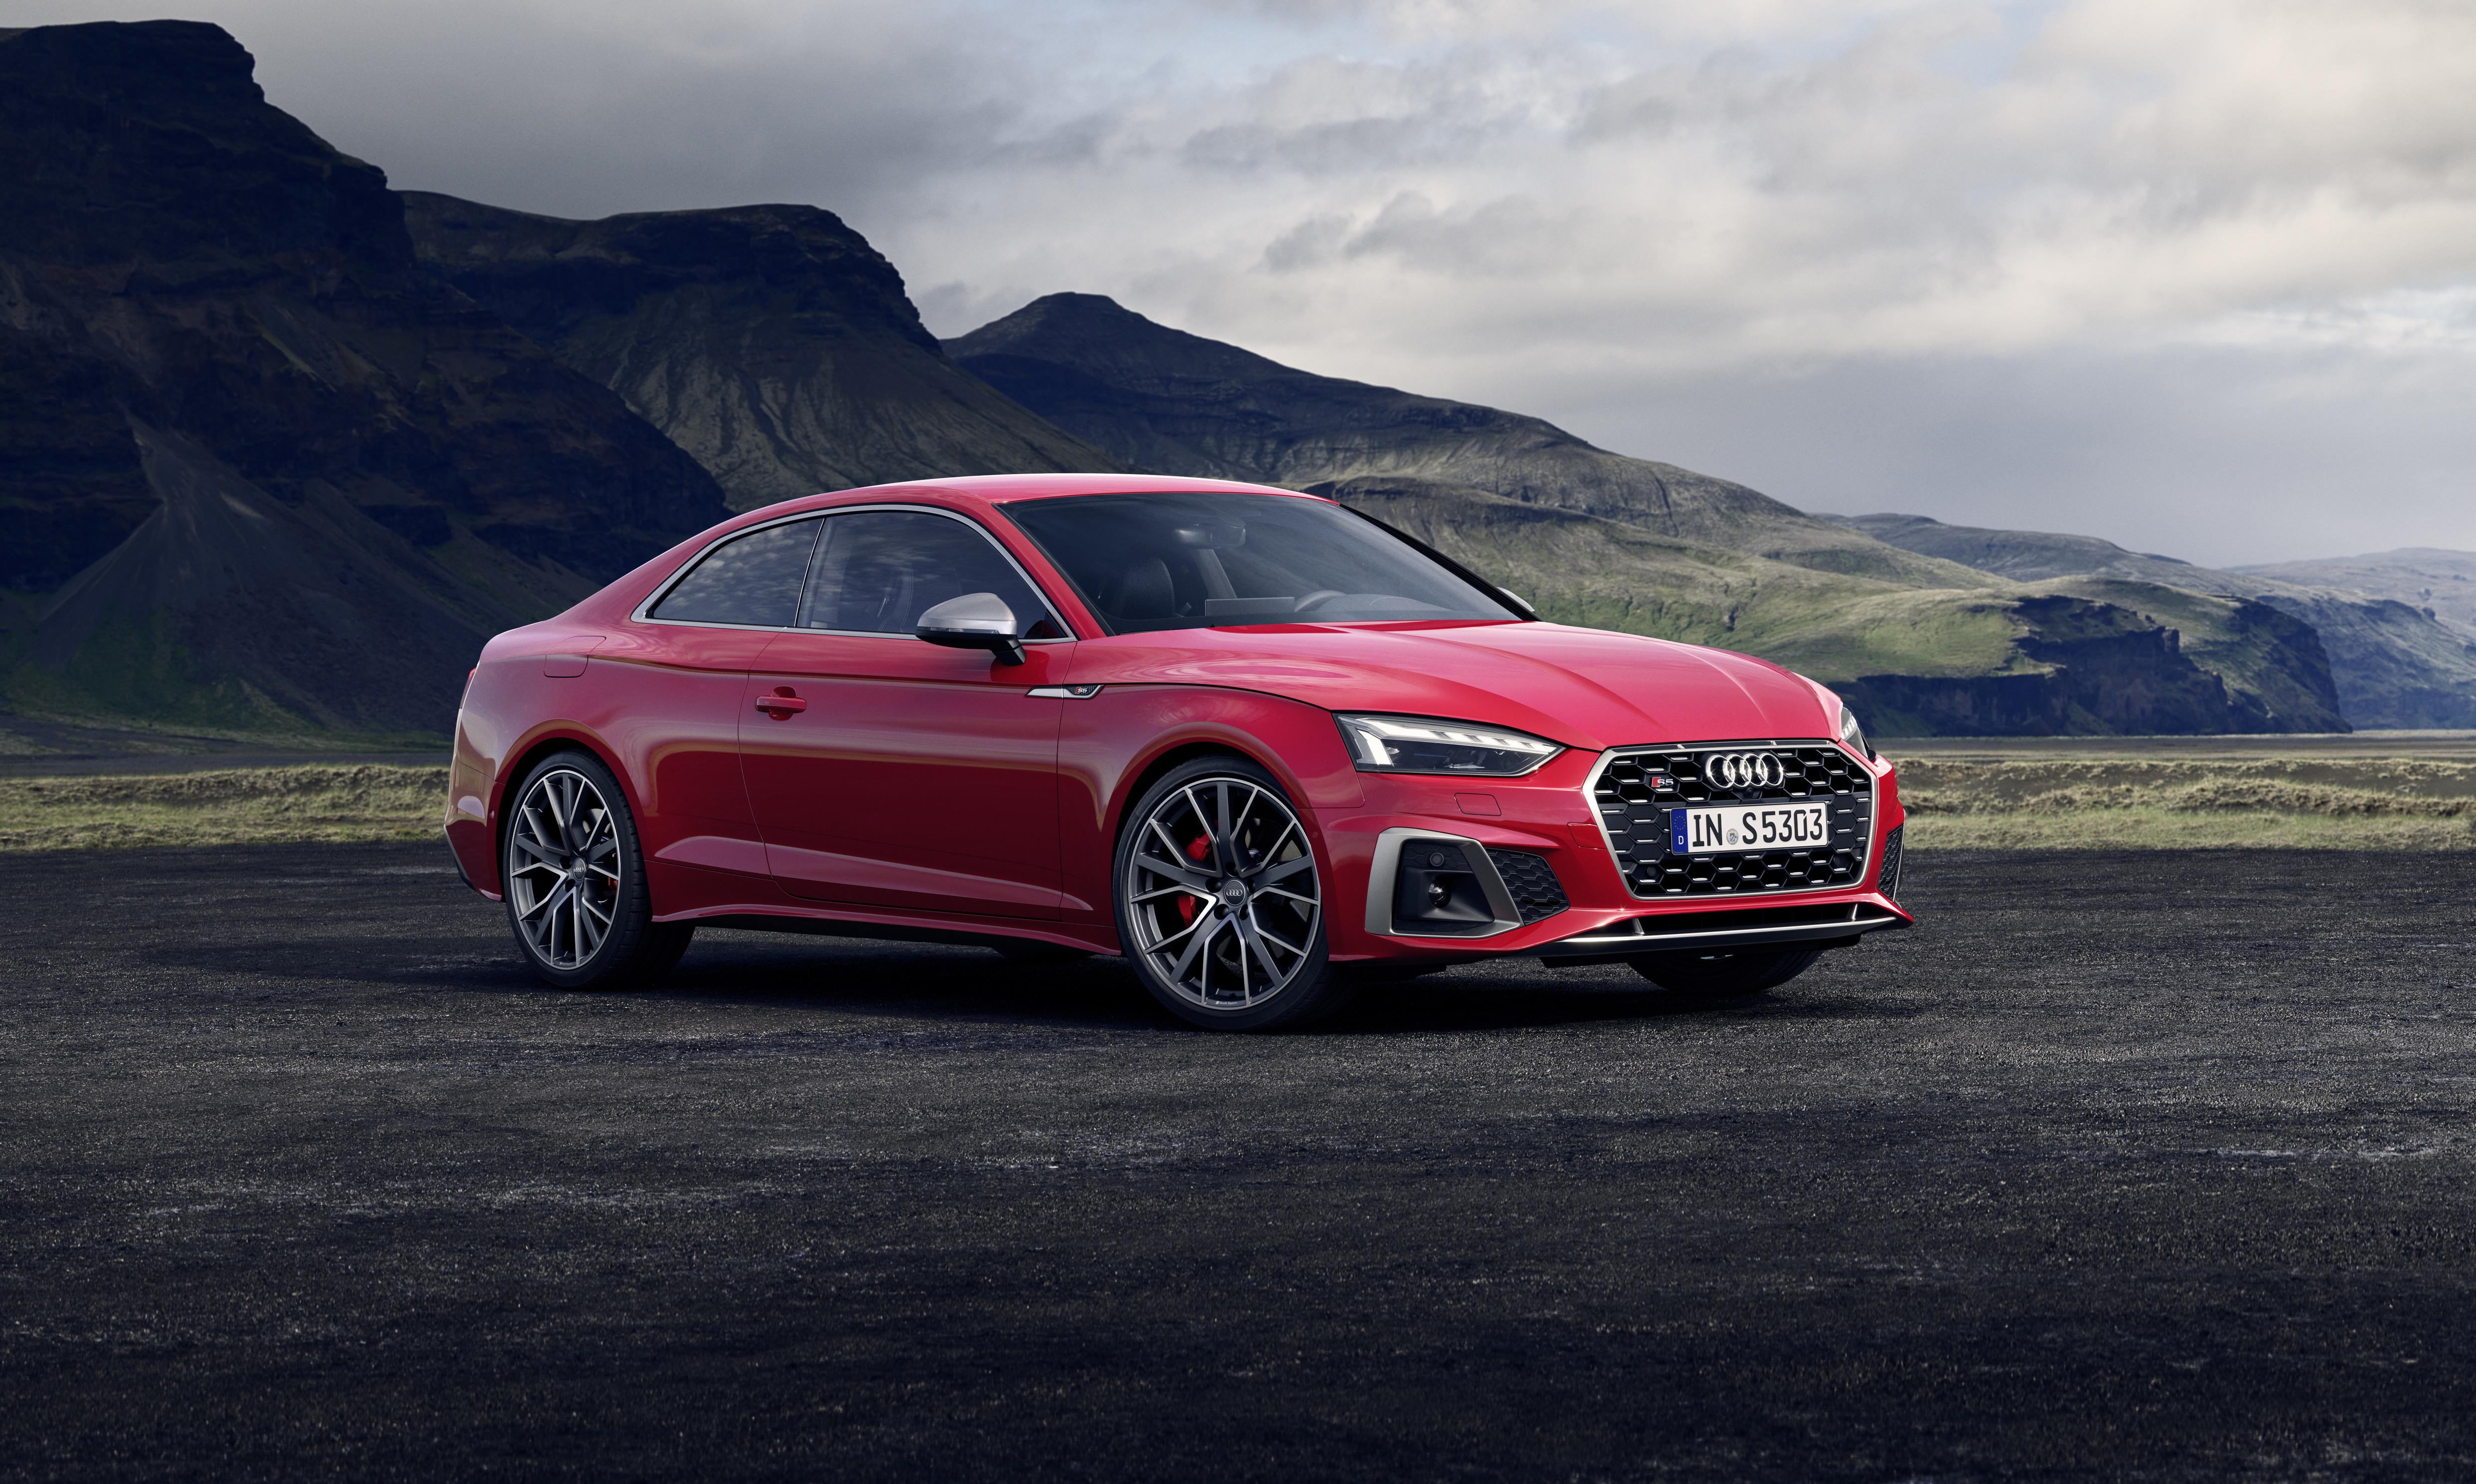 2020 Audi S5 4k Ultra Hd Wallpaper Background Image 4961x2974